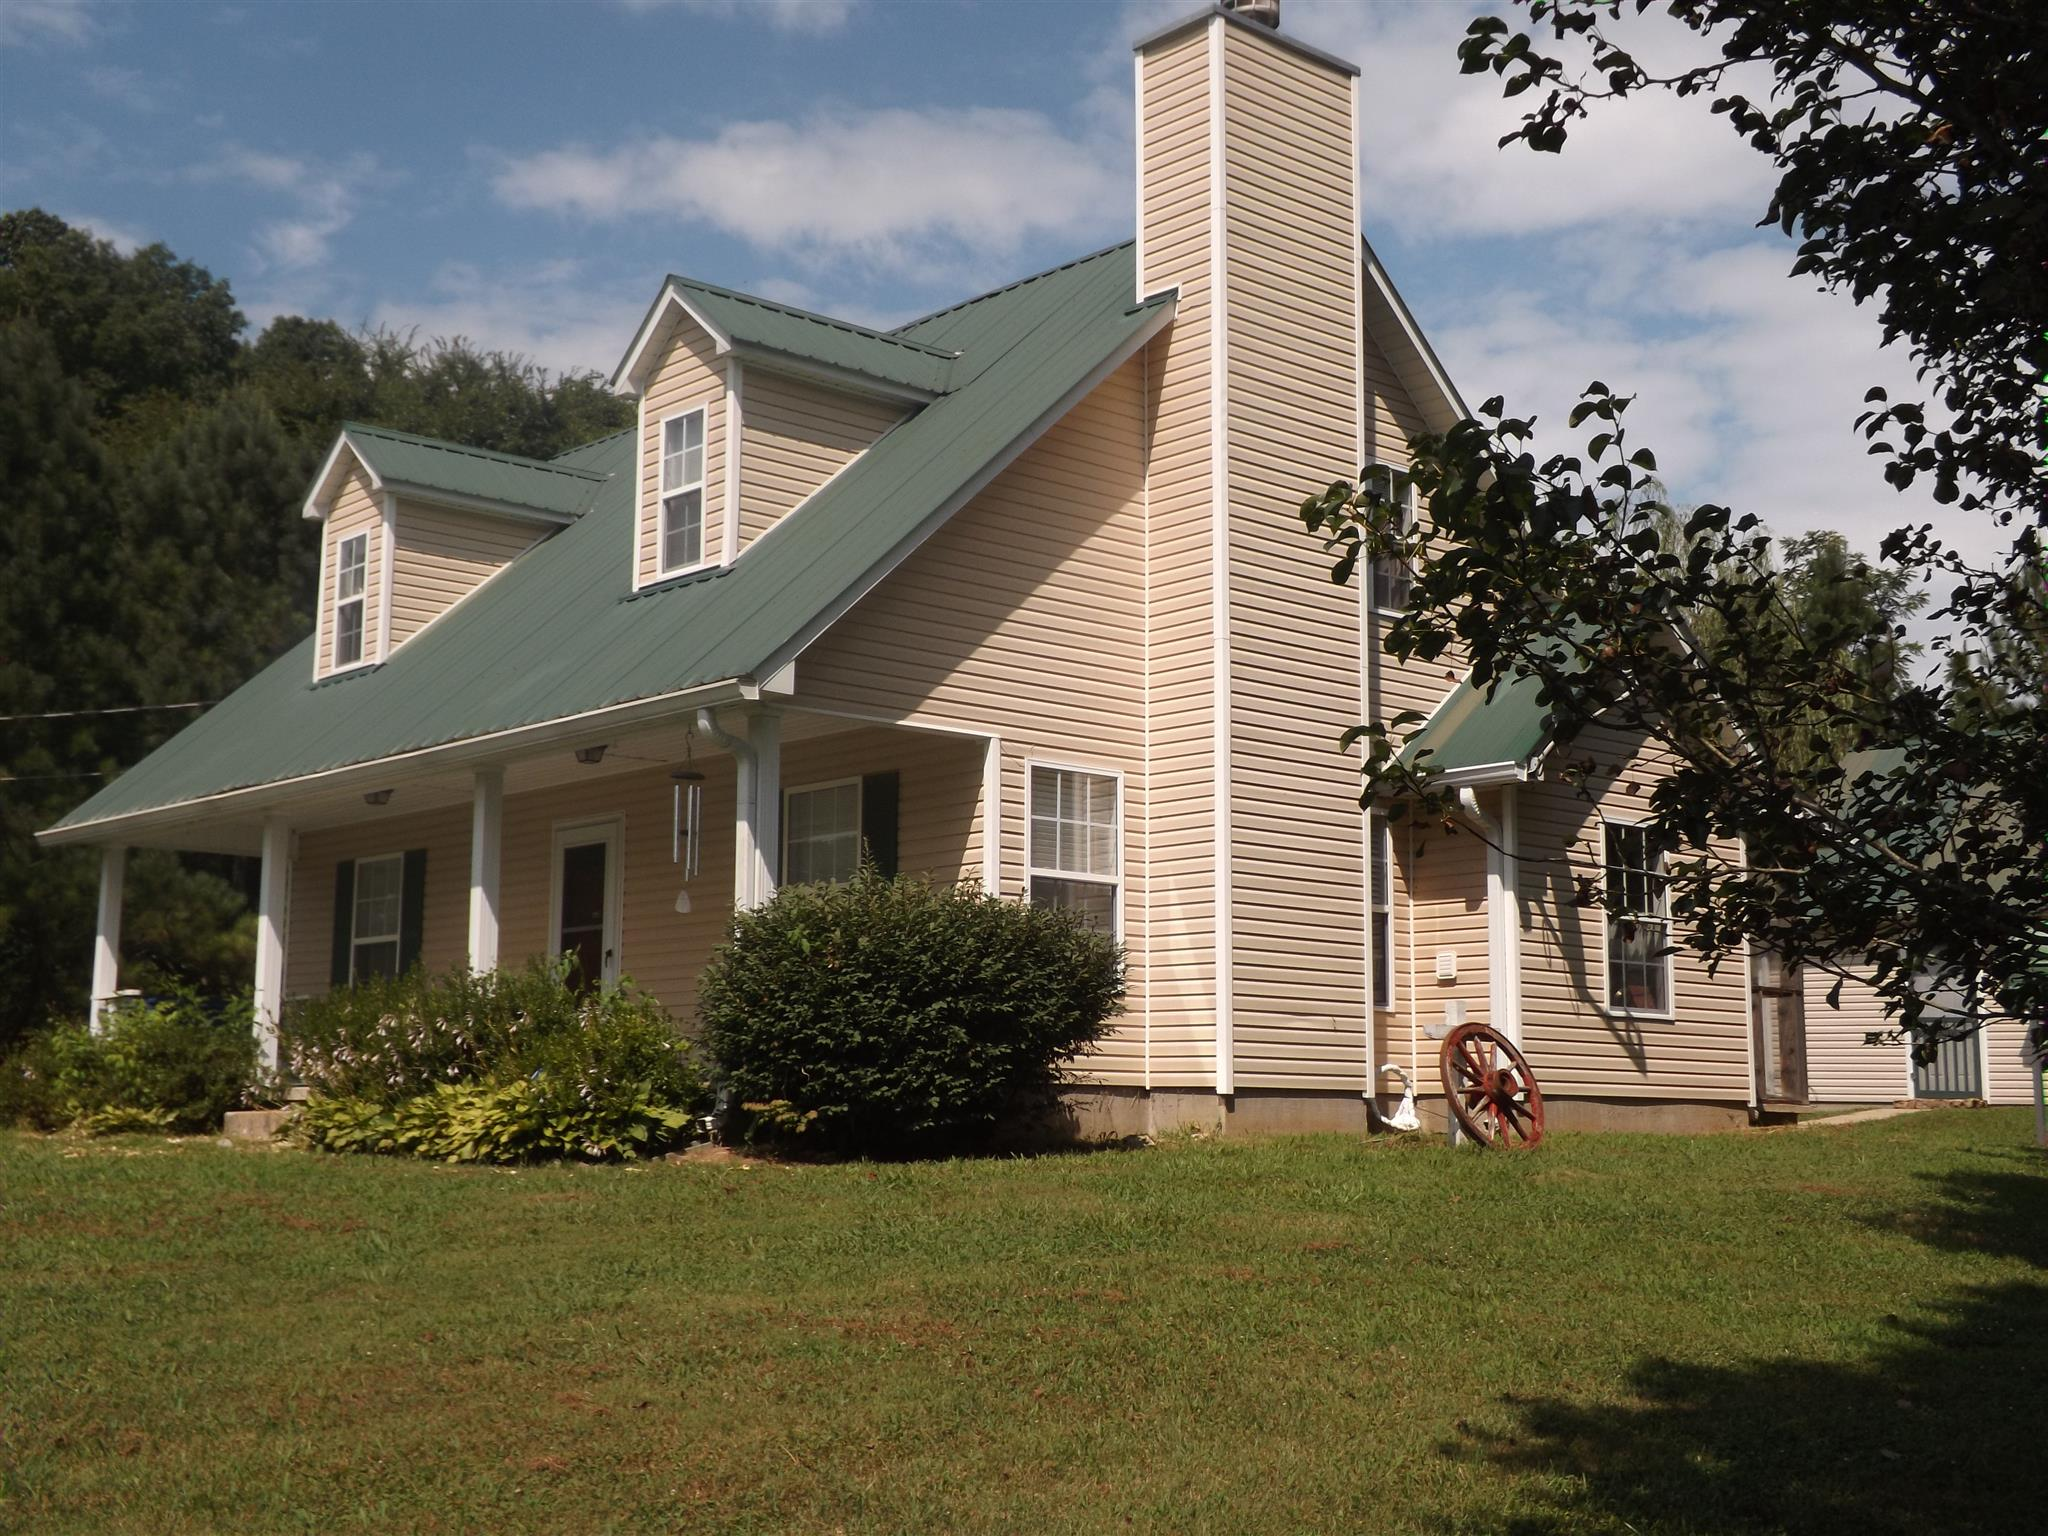 10595 Minor Hill Hwy, Goodspring, TN 38460 - Goodspring, TN real estate listing